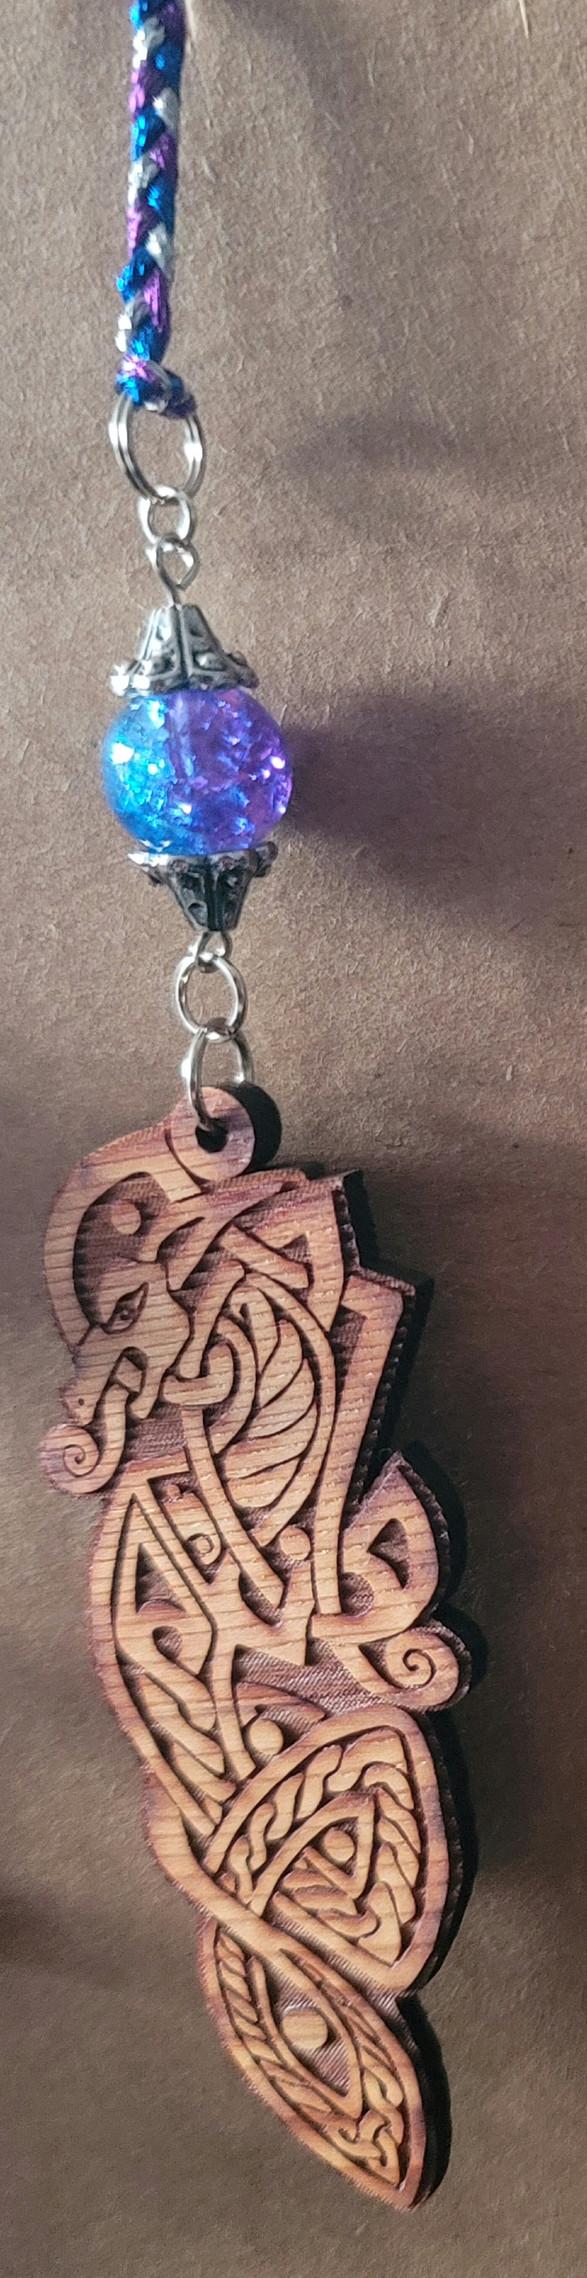 Celtic Dragon - Bookmark/Decoration